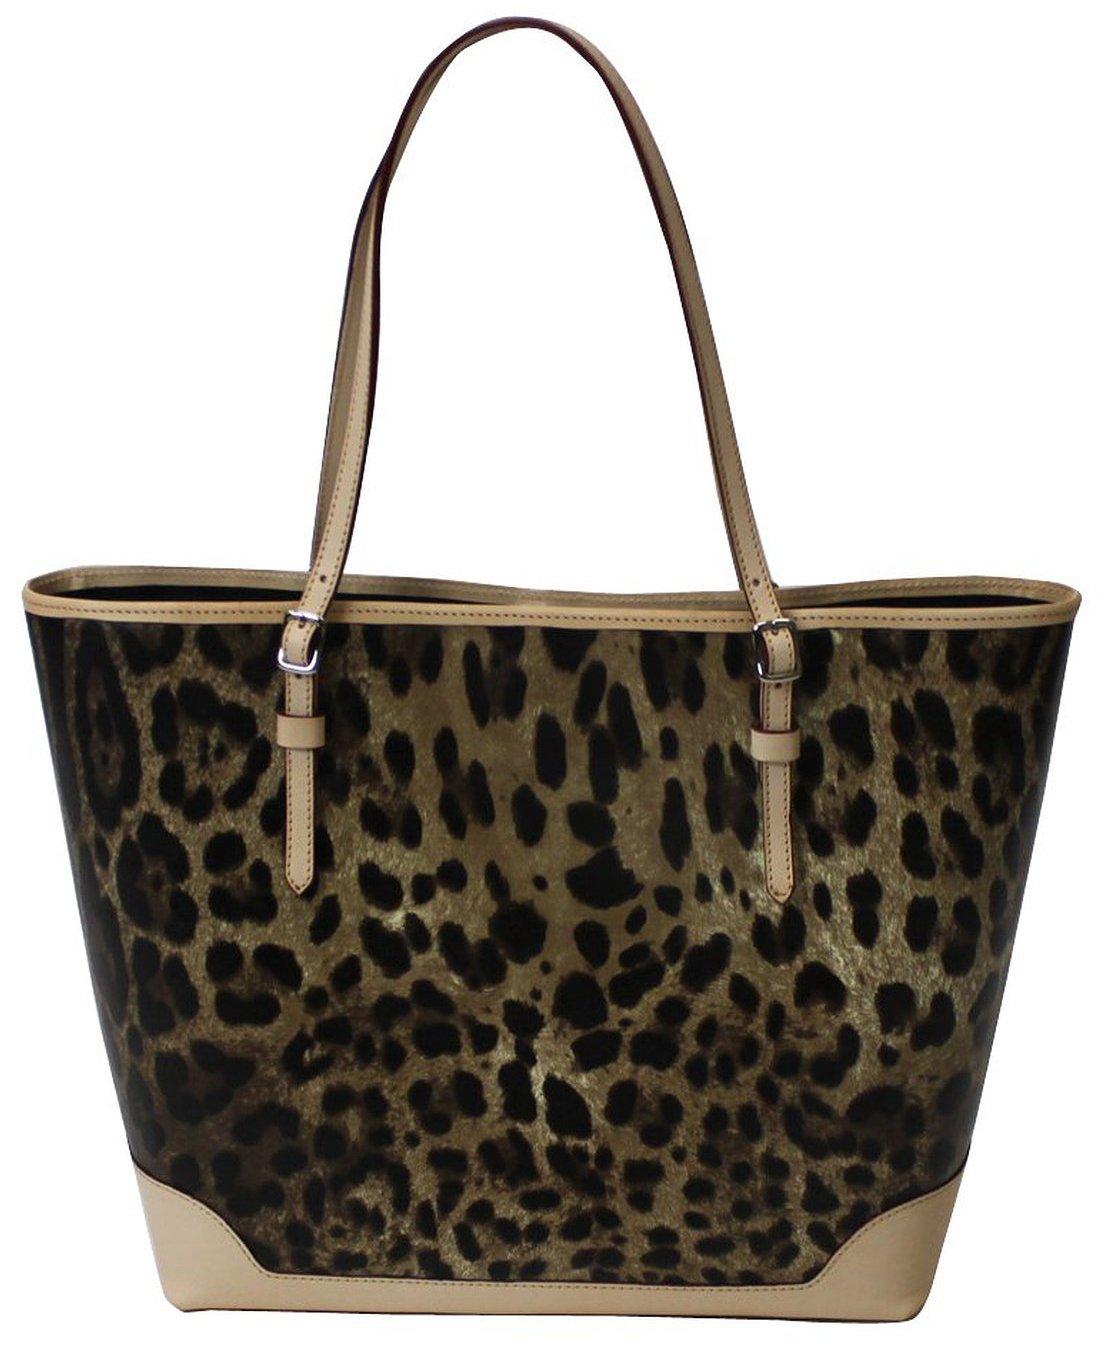 Italian Leopard Large Women's Tote Bag Size Medium